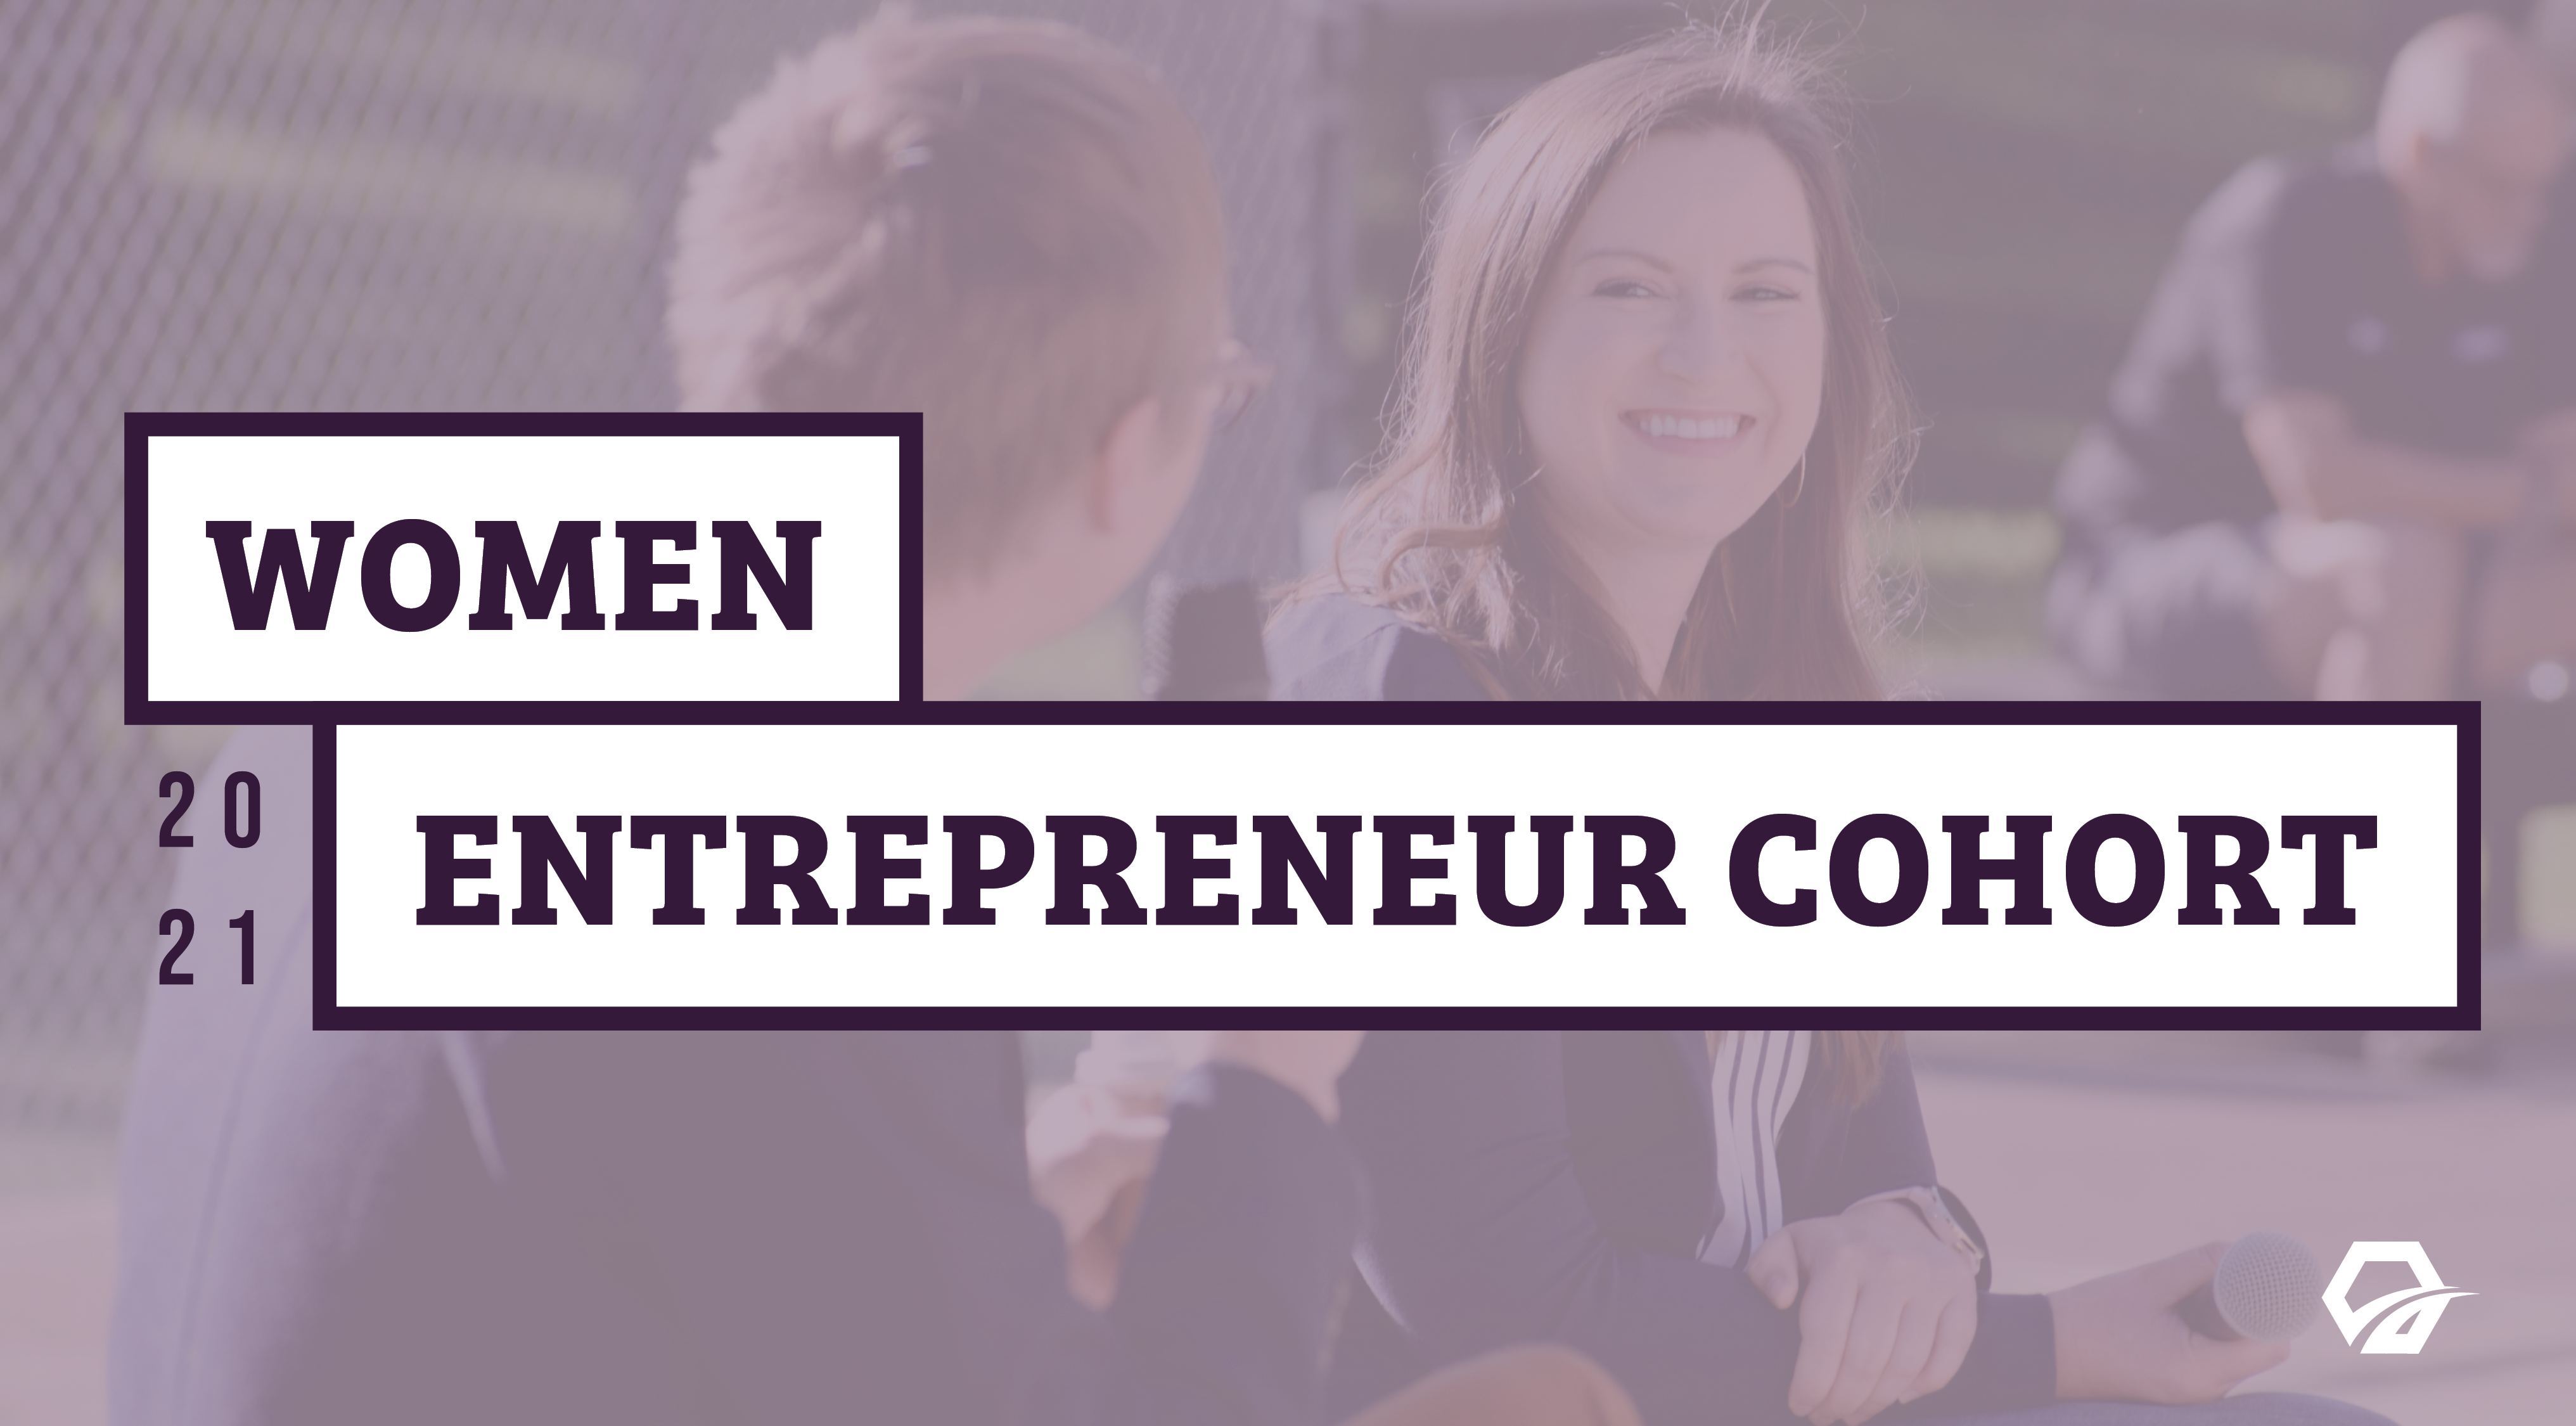 Women Entrepreneur Cohort